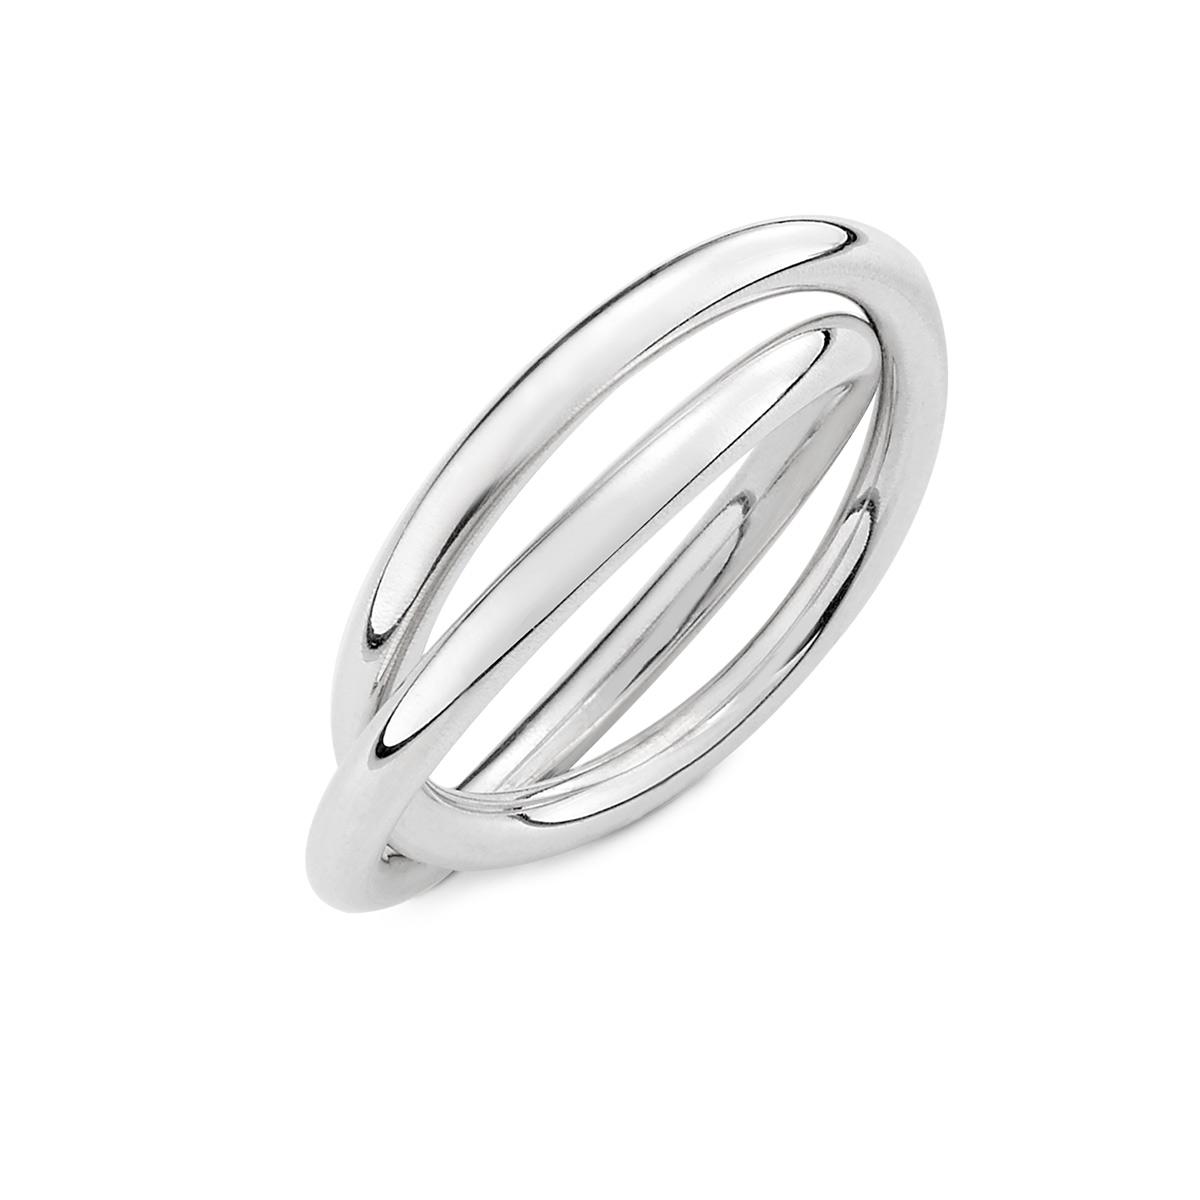 KSW339 簡約雙環戒指